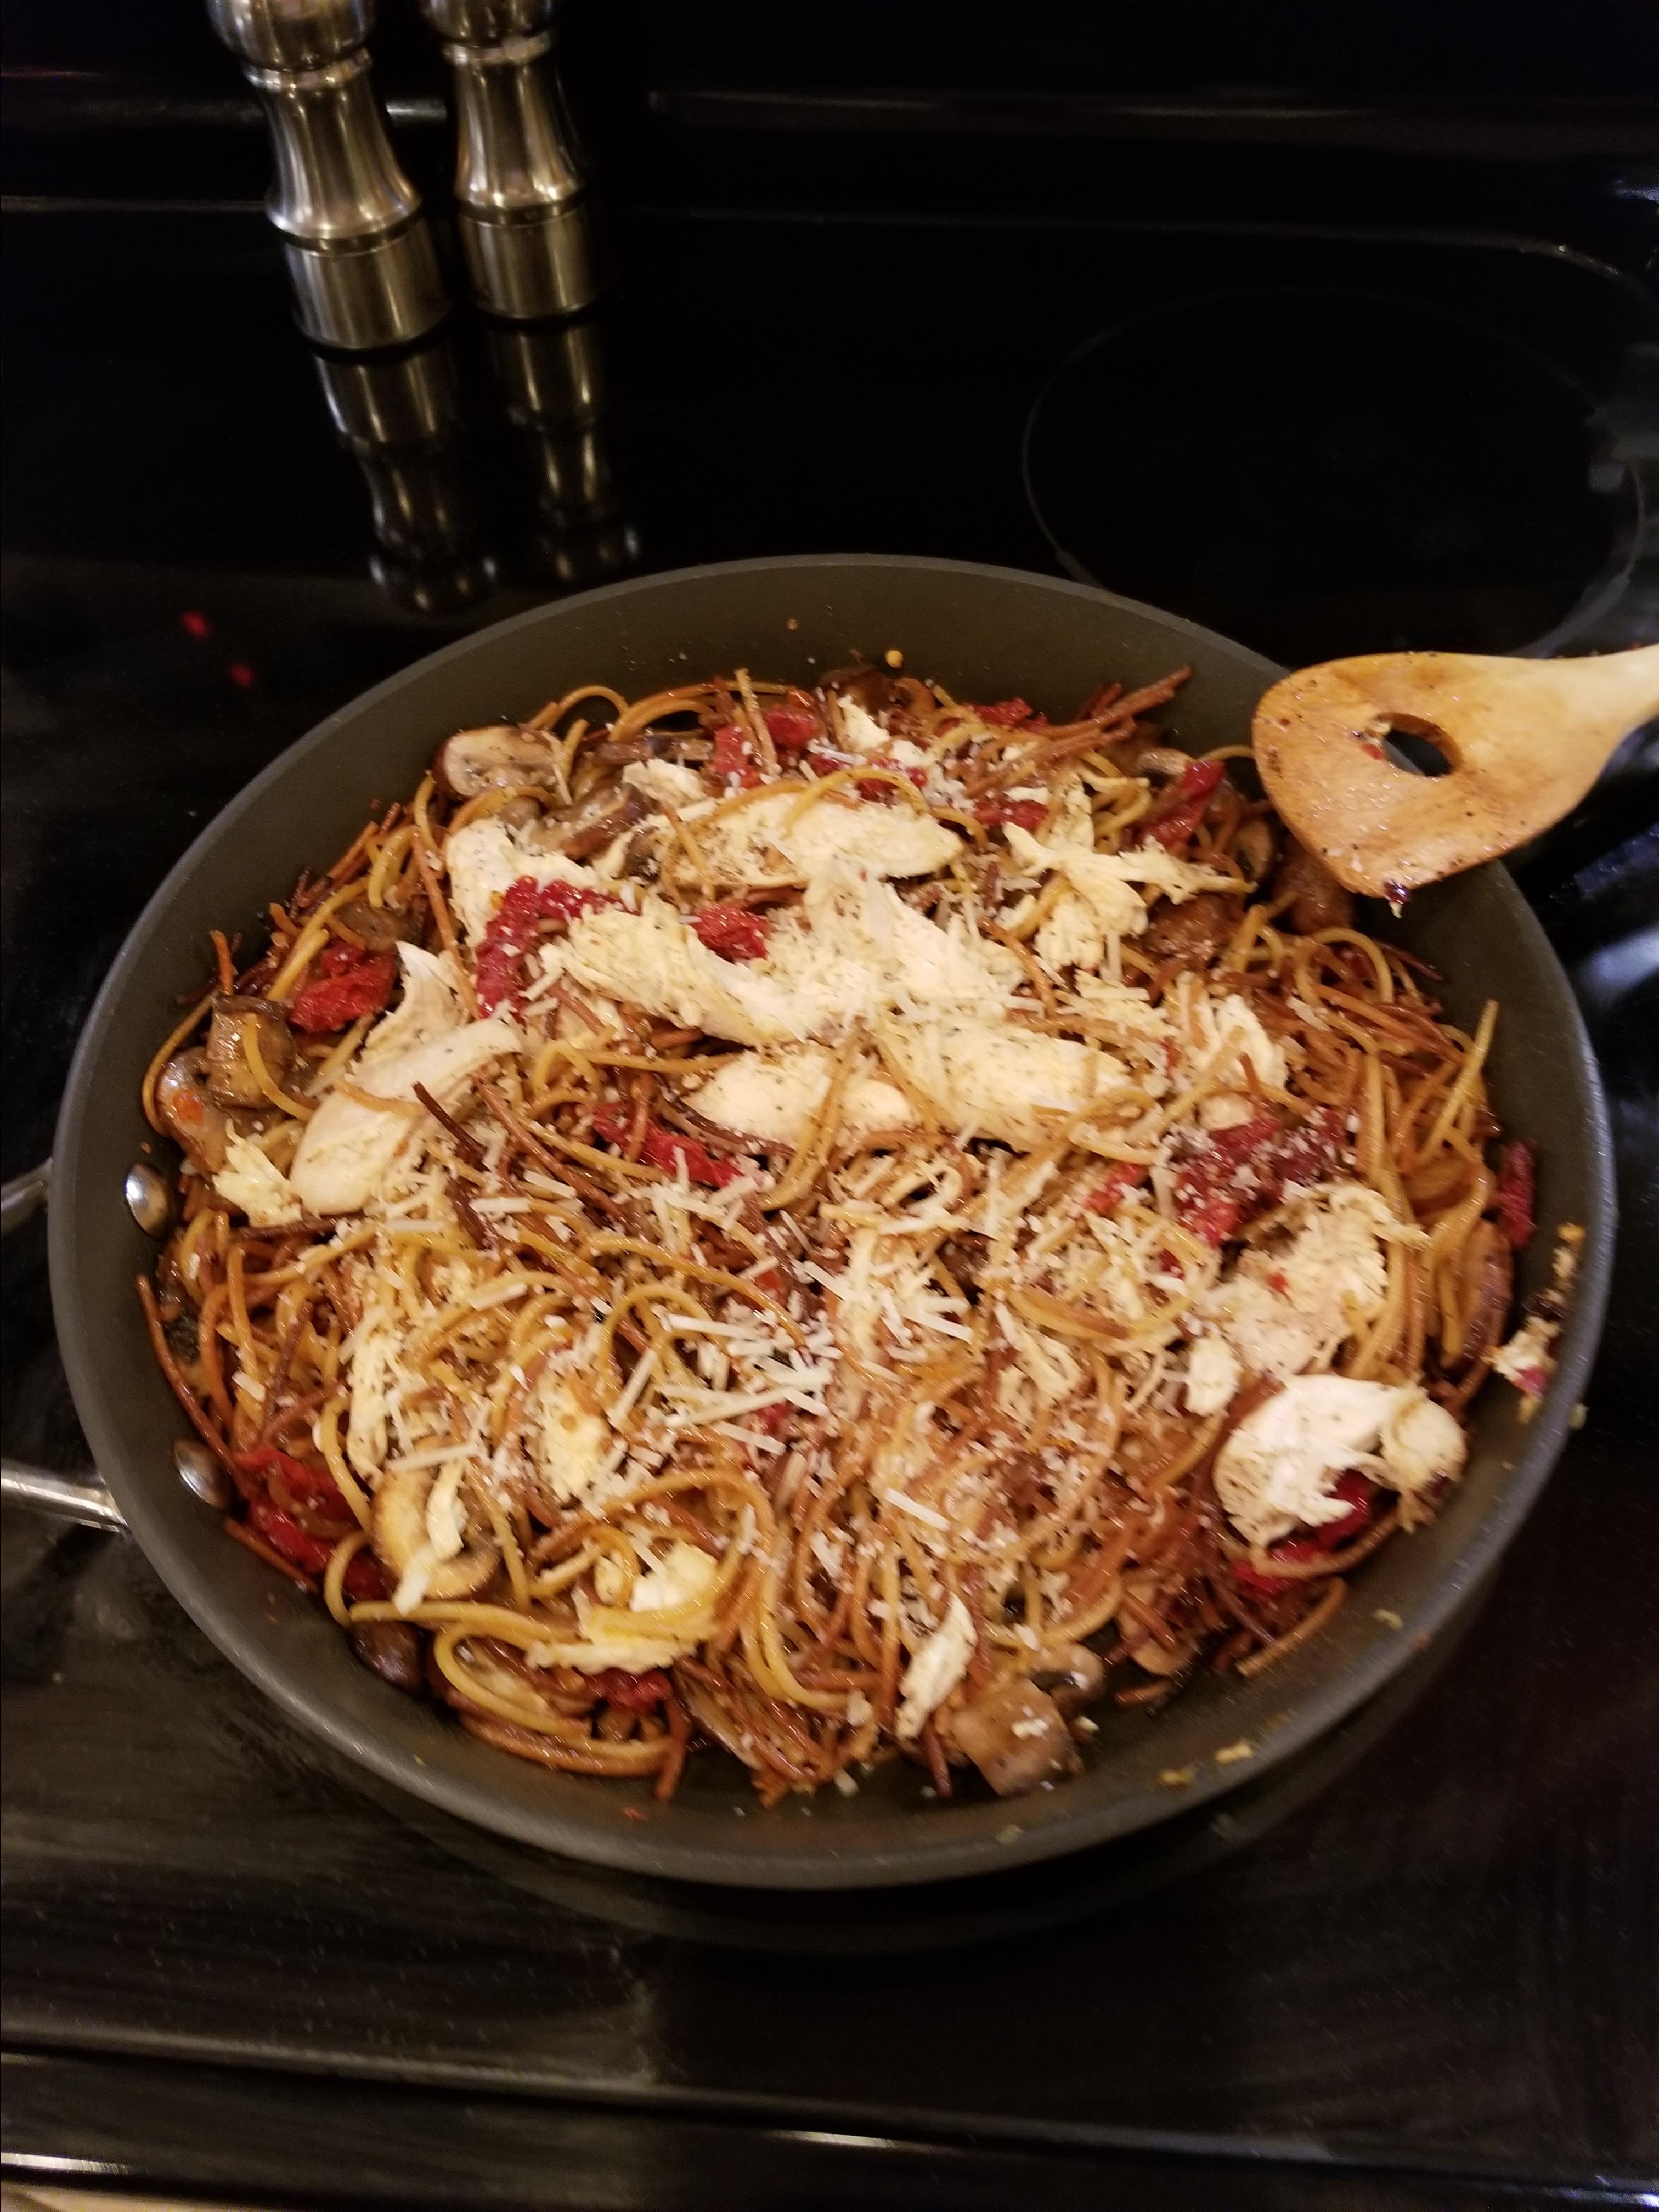 Broken Spaghetti Risotto kkingsley2